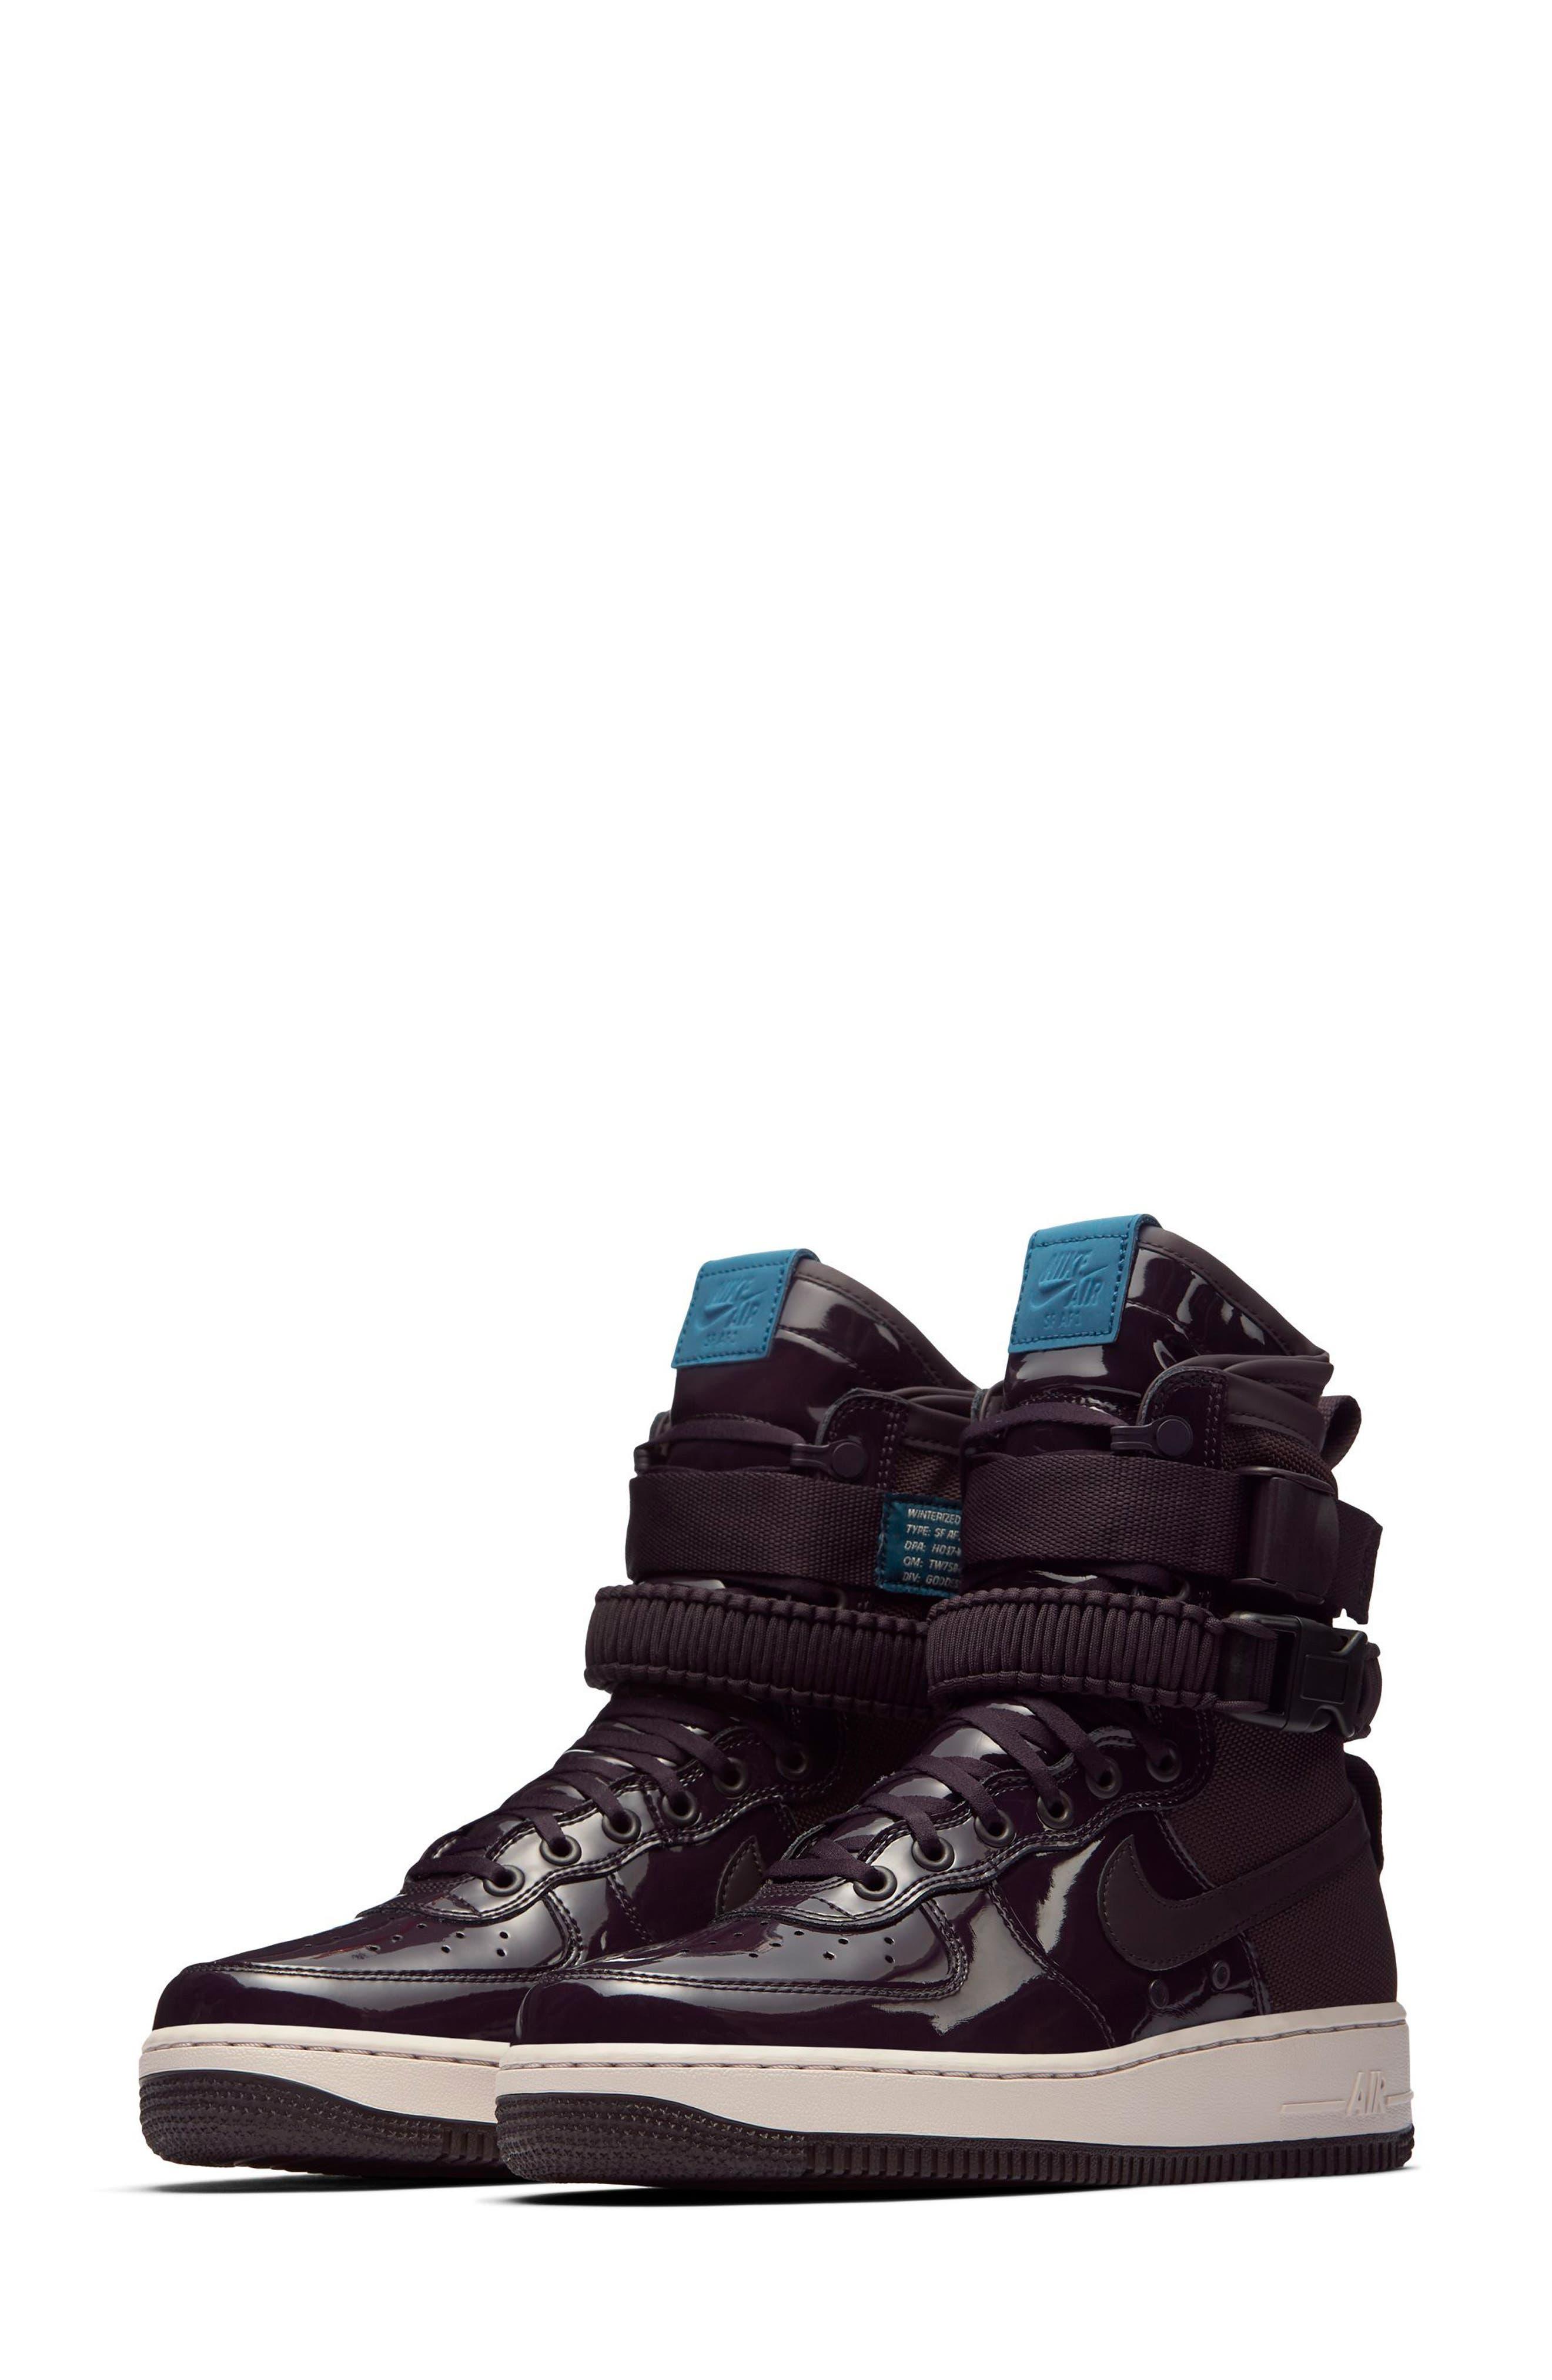 SF Air Force 1 High Top Sneaker,                         Main,                         color, Port Wine/ Port Wine